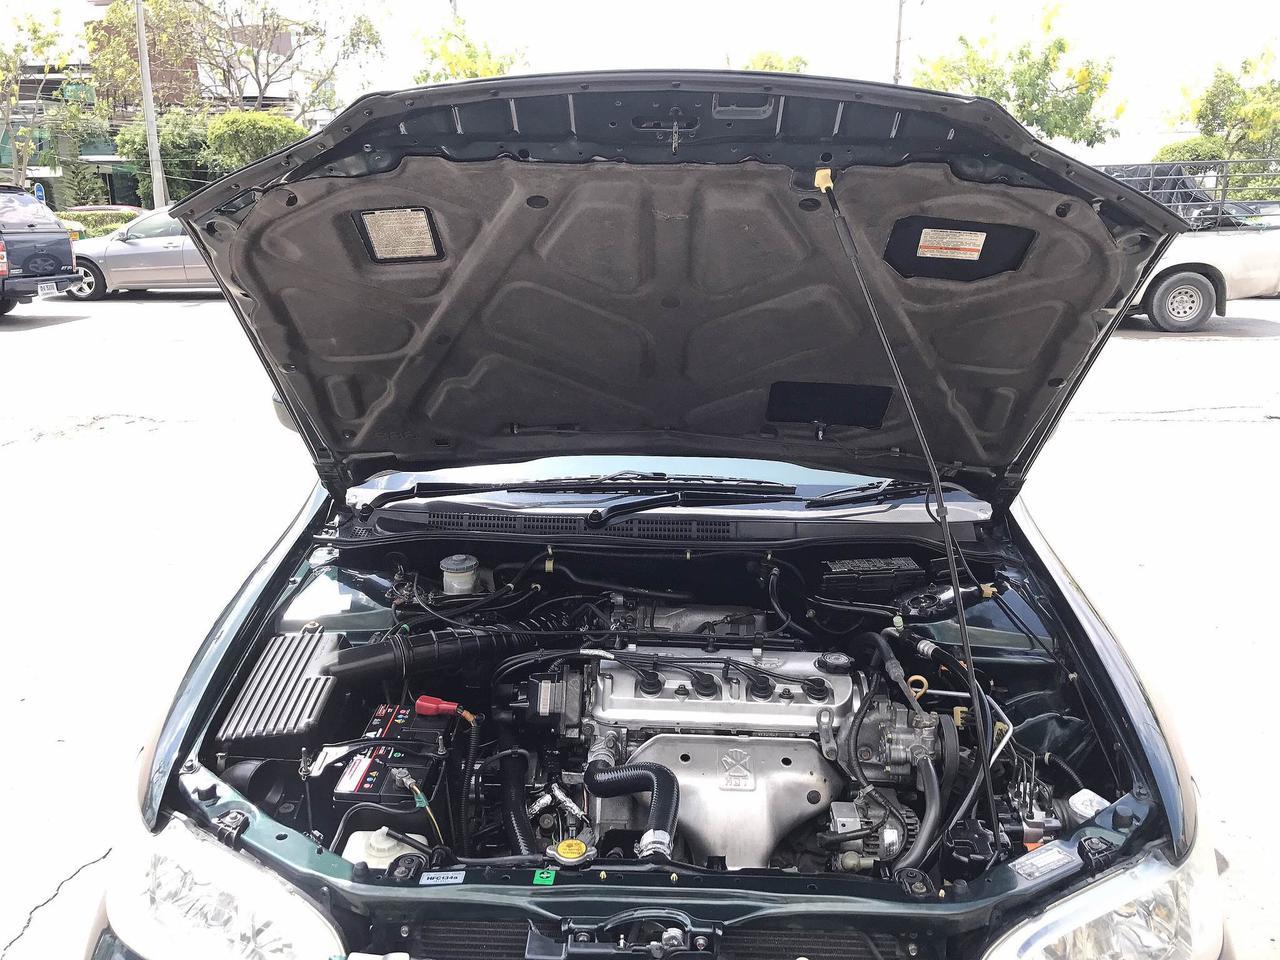 HONDA ACCORD 2.3 auto รุ่นงูเห่า ปี2001 รถบ้านสวยเดิมกริบสุด รูปที่ 6